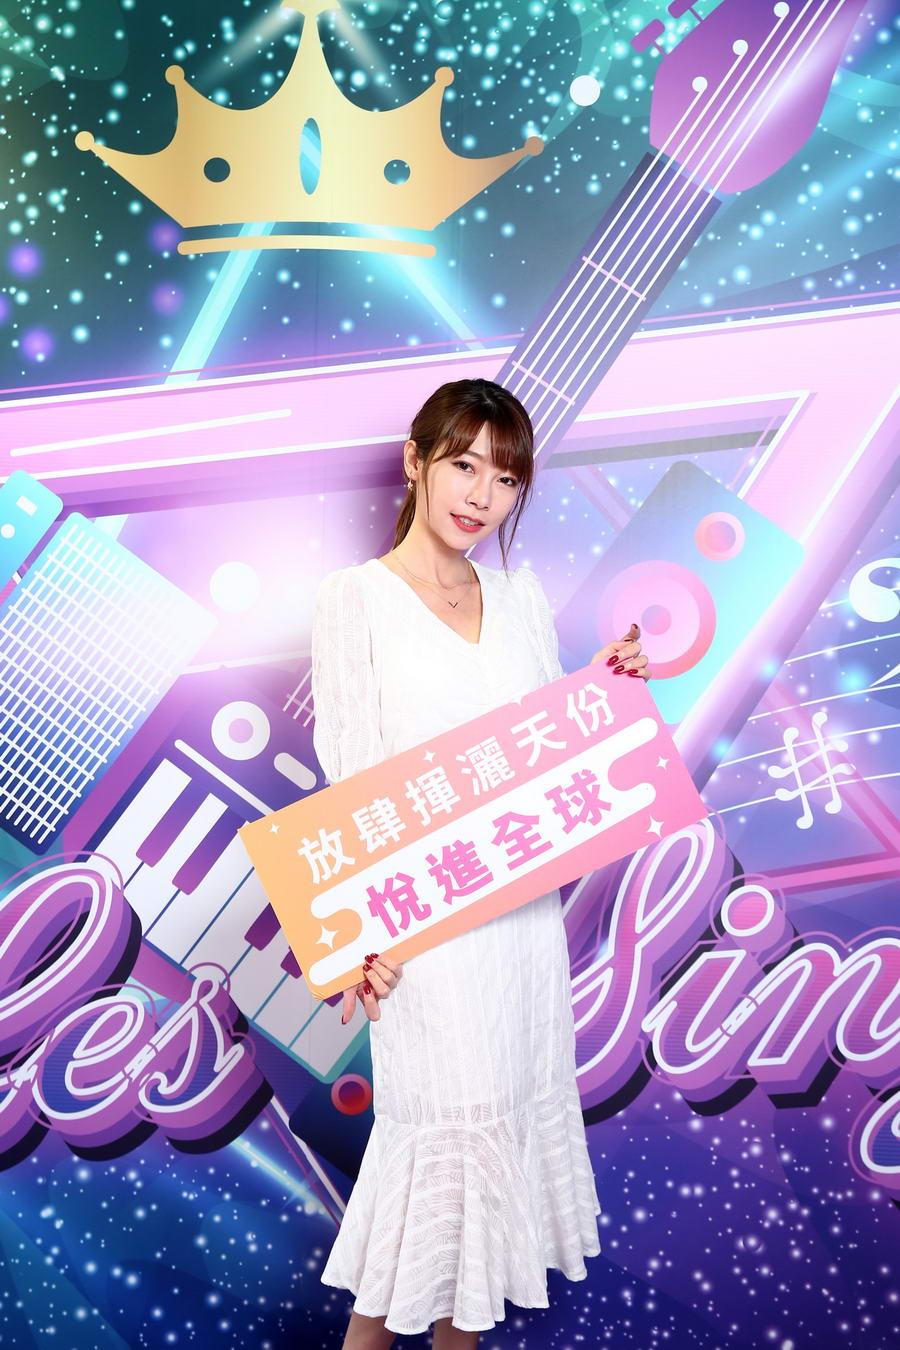 17LIVE人氣直播主-清甜系女神寶倪Baoni